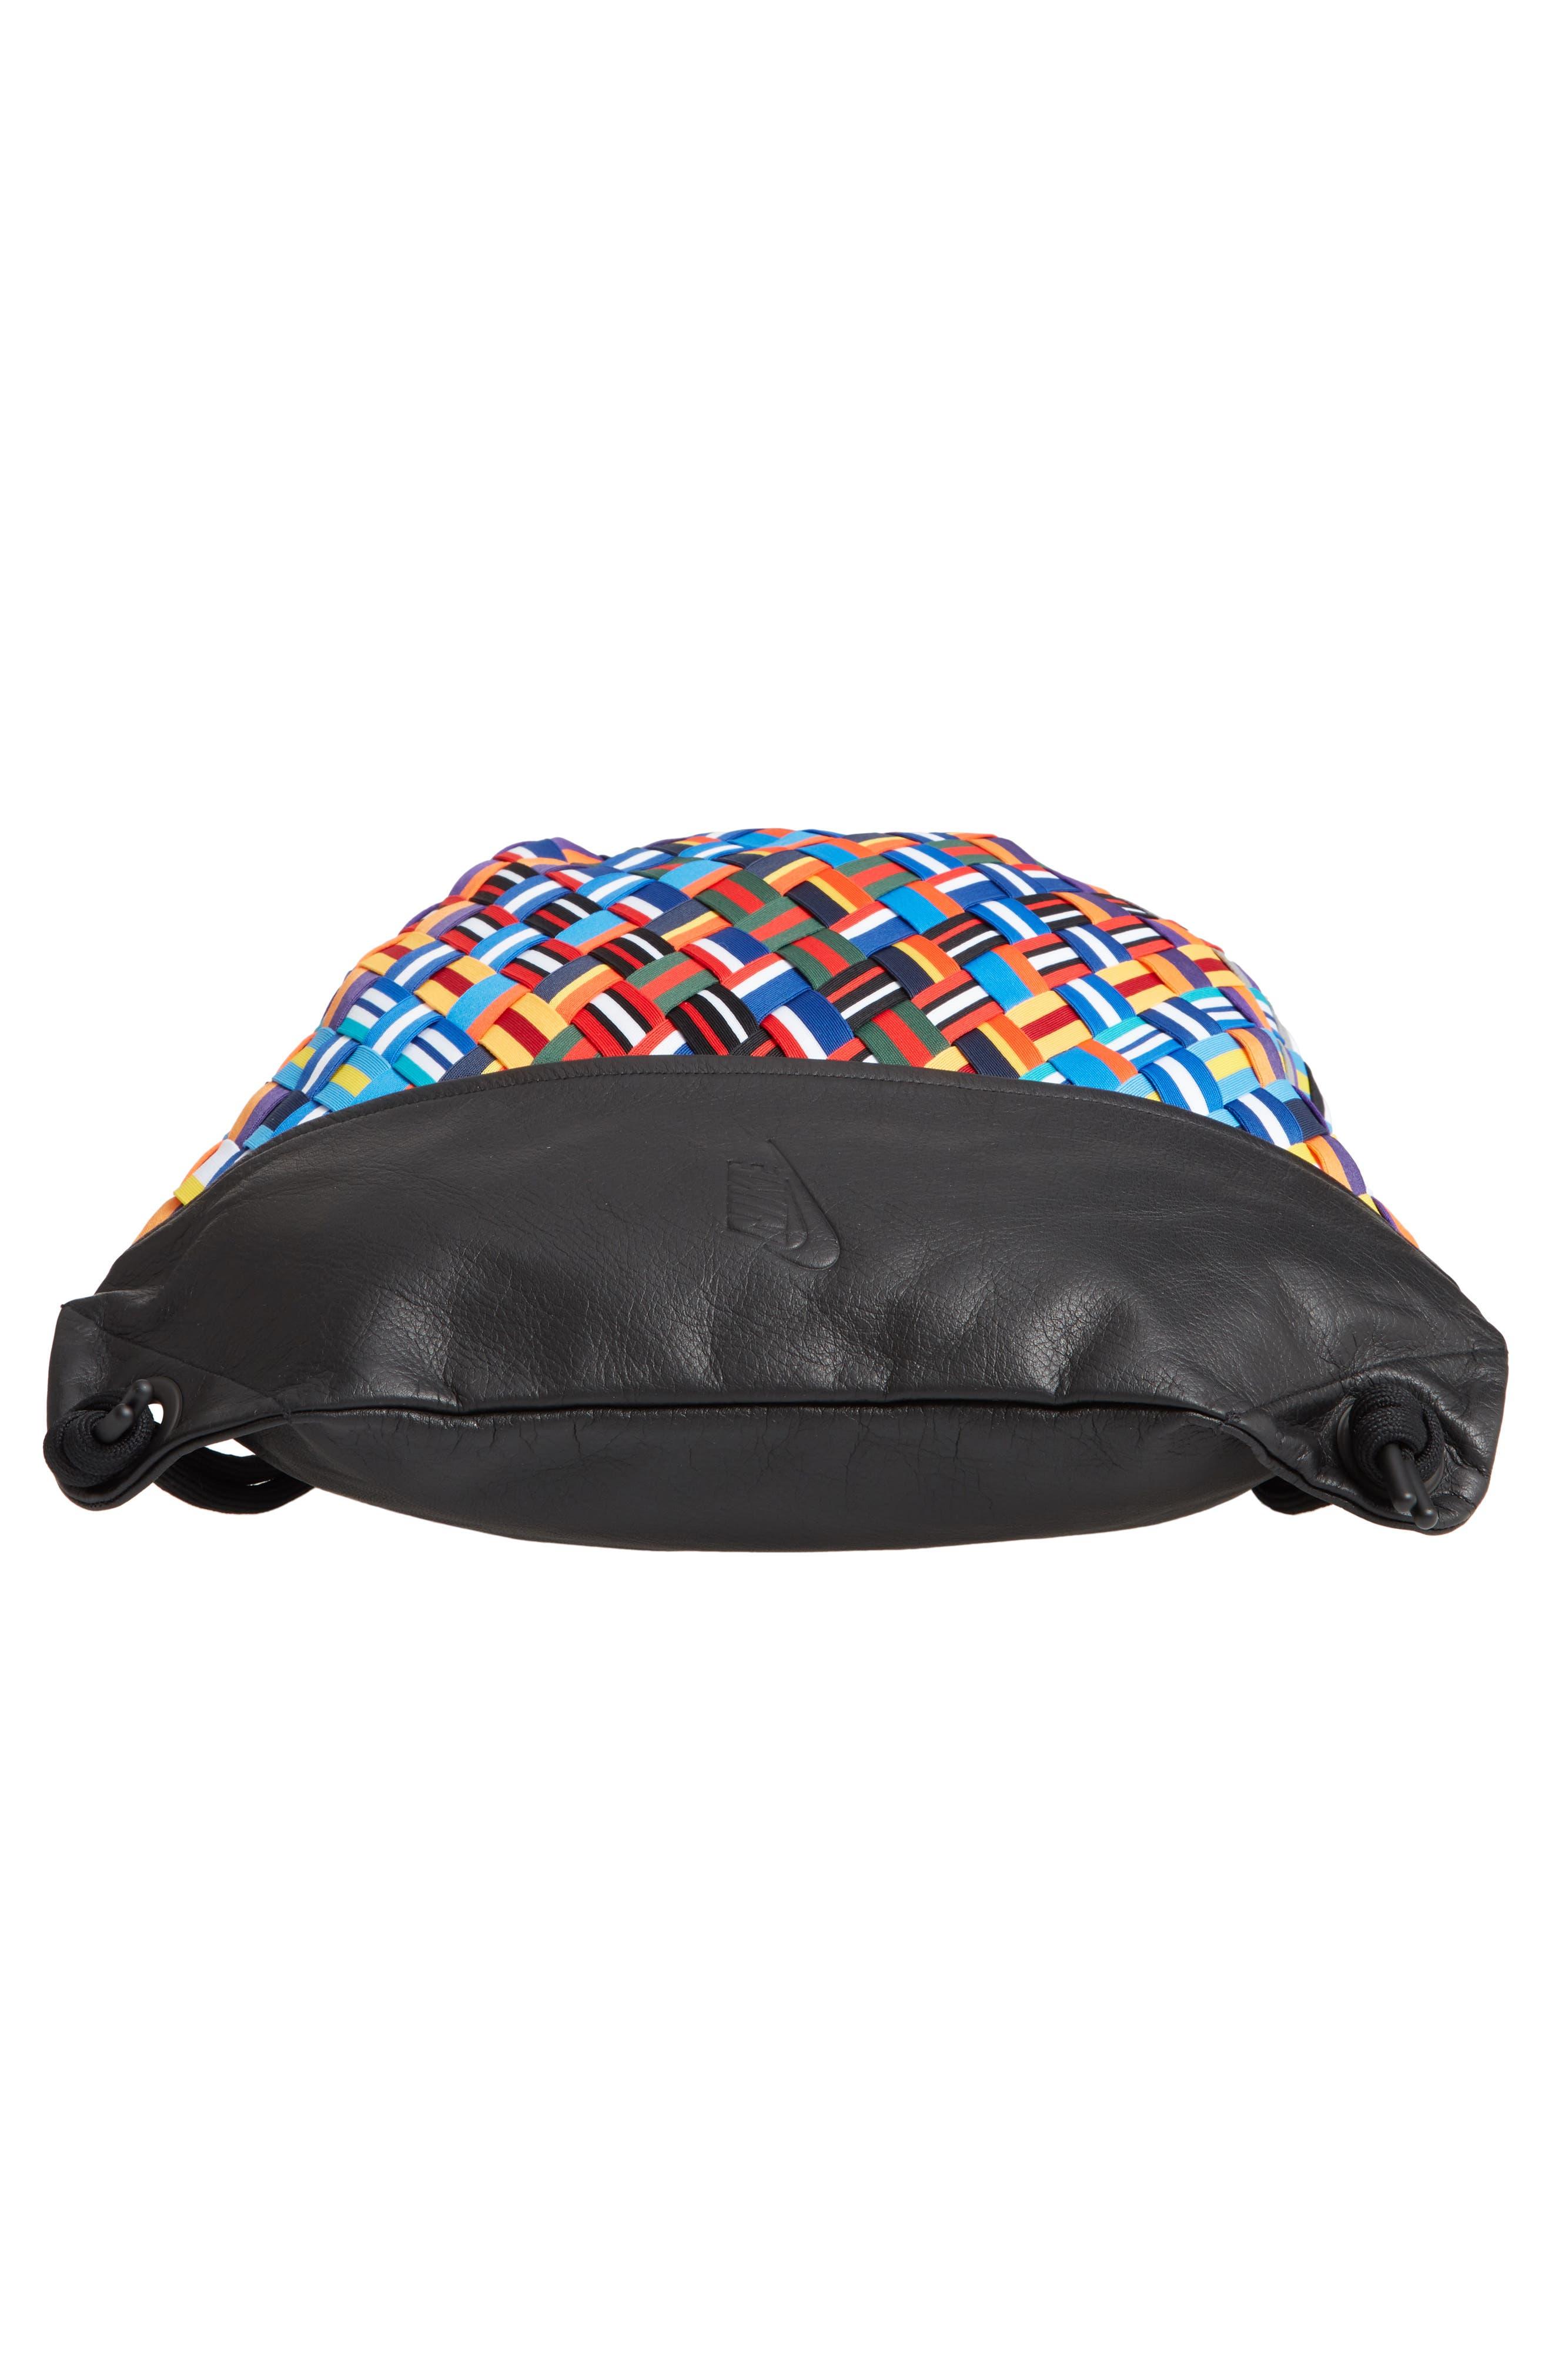 NIKE,                             NikeLab Basketball Backpack,                             Alternate thumbnail 6, color,                             BLACK